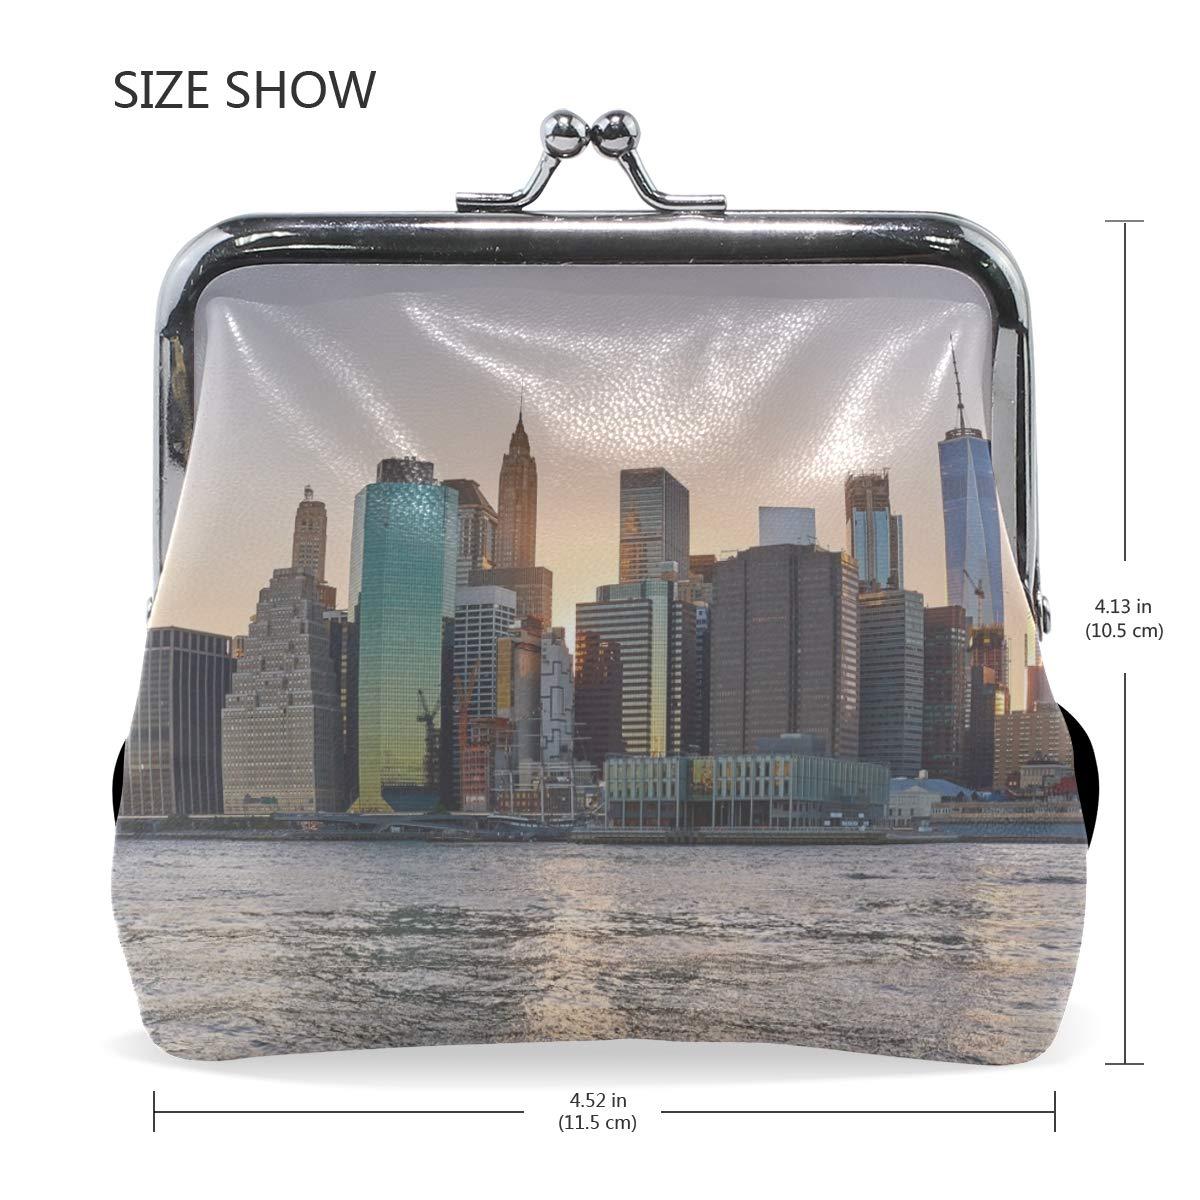 Your Home Coin Purse New York Usa Skyscrapers Beach Print Wallet Exquisite Clasp Coin Purse Girls Women Clutch Handbag